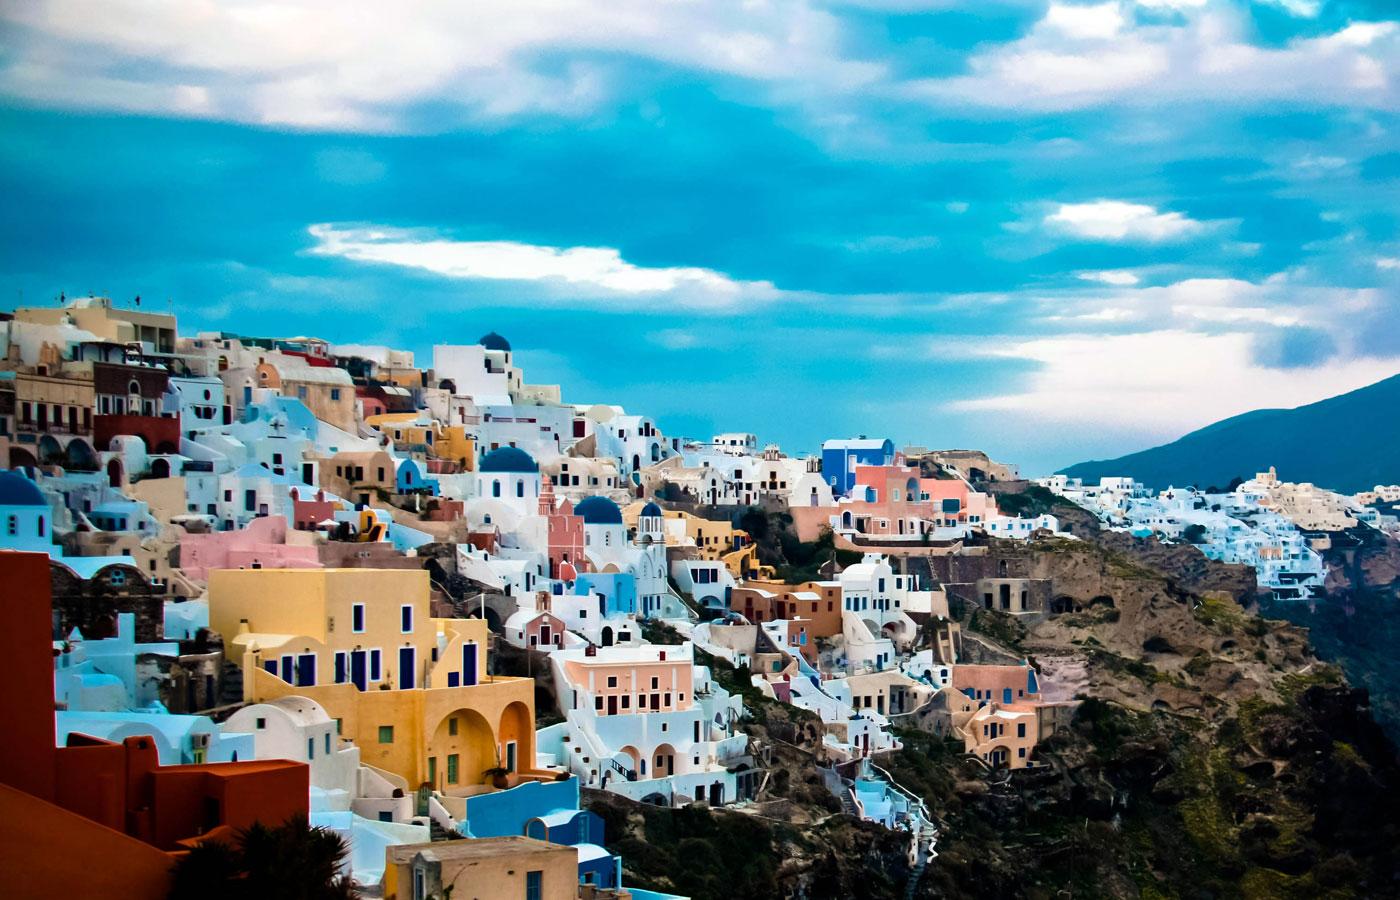 santorini-greece-photo-4